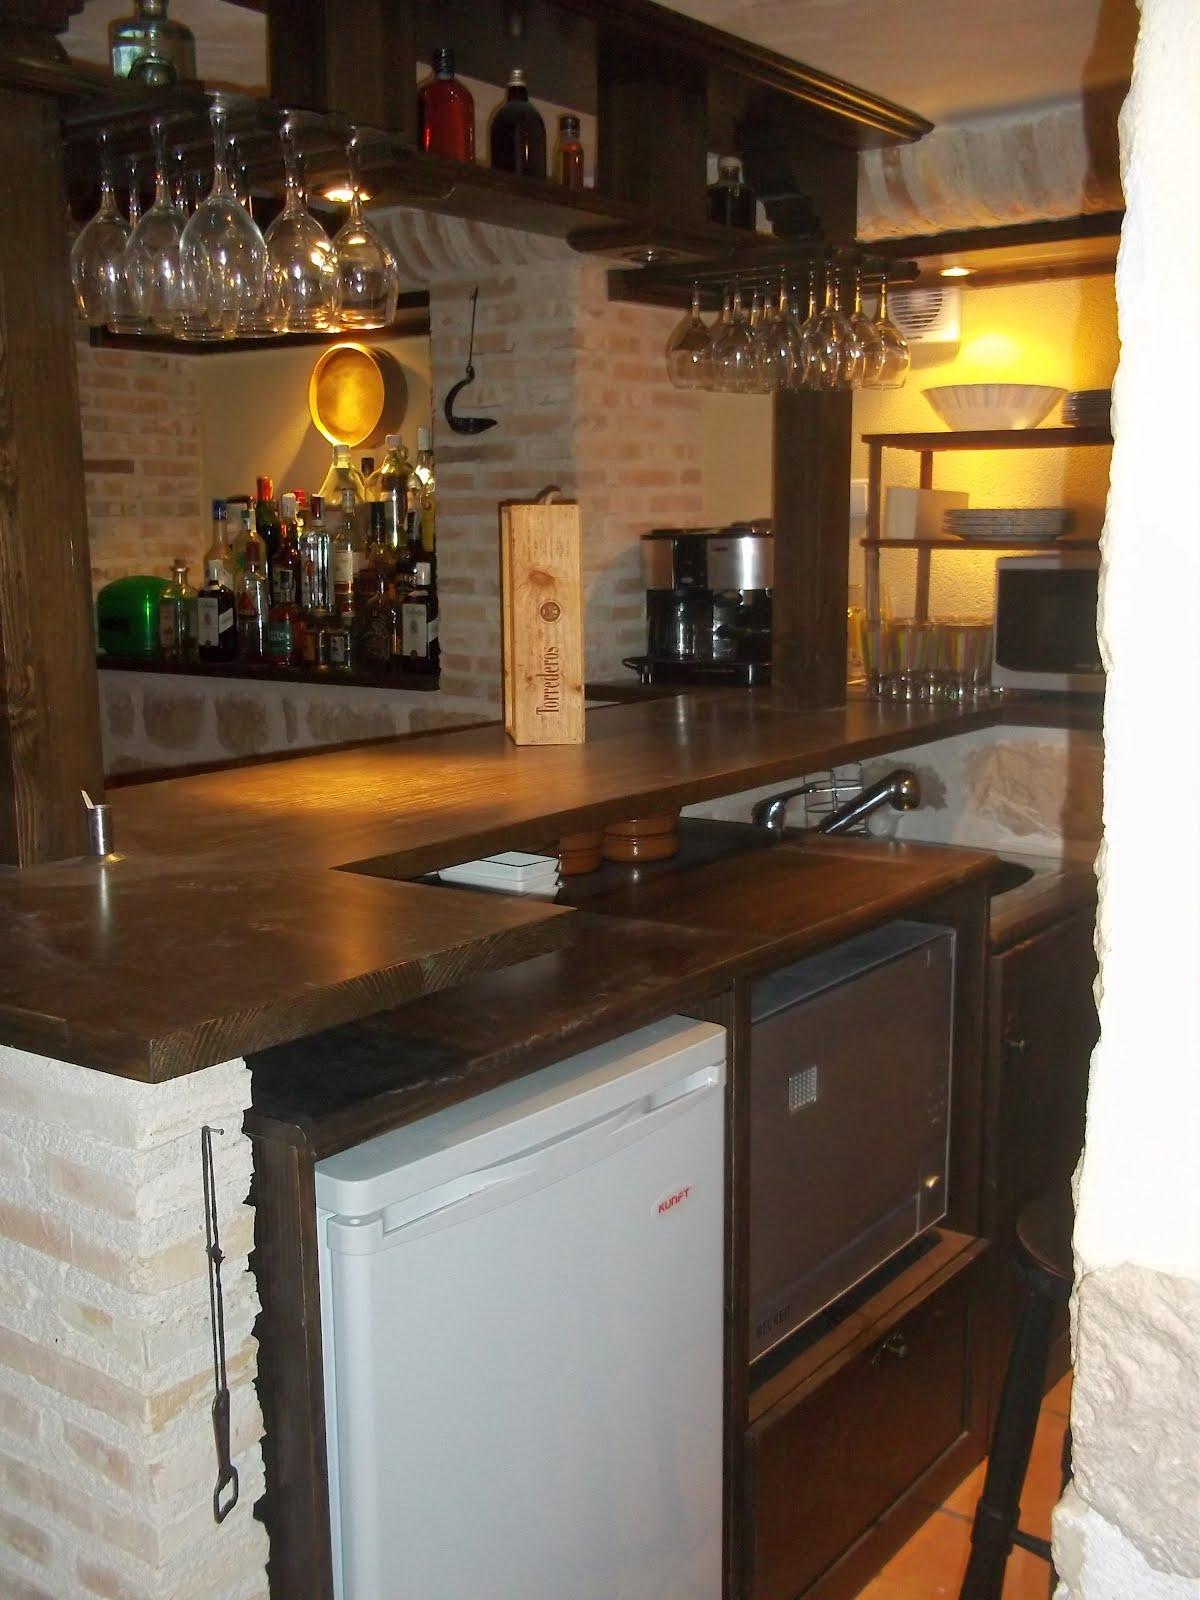 Carpinteria viosca roda barra de bar y botellero - Estanterias para bares ...